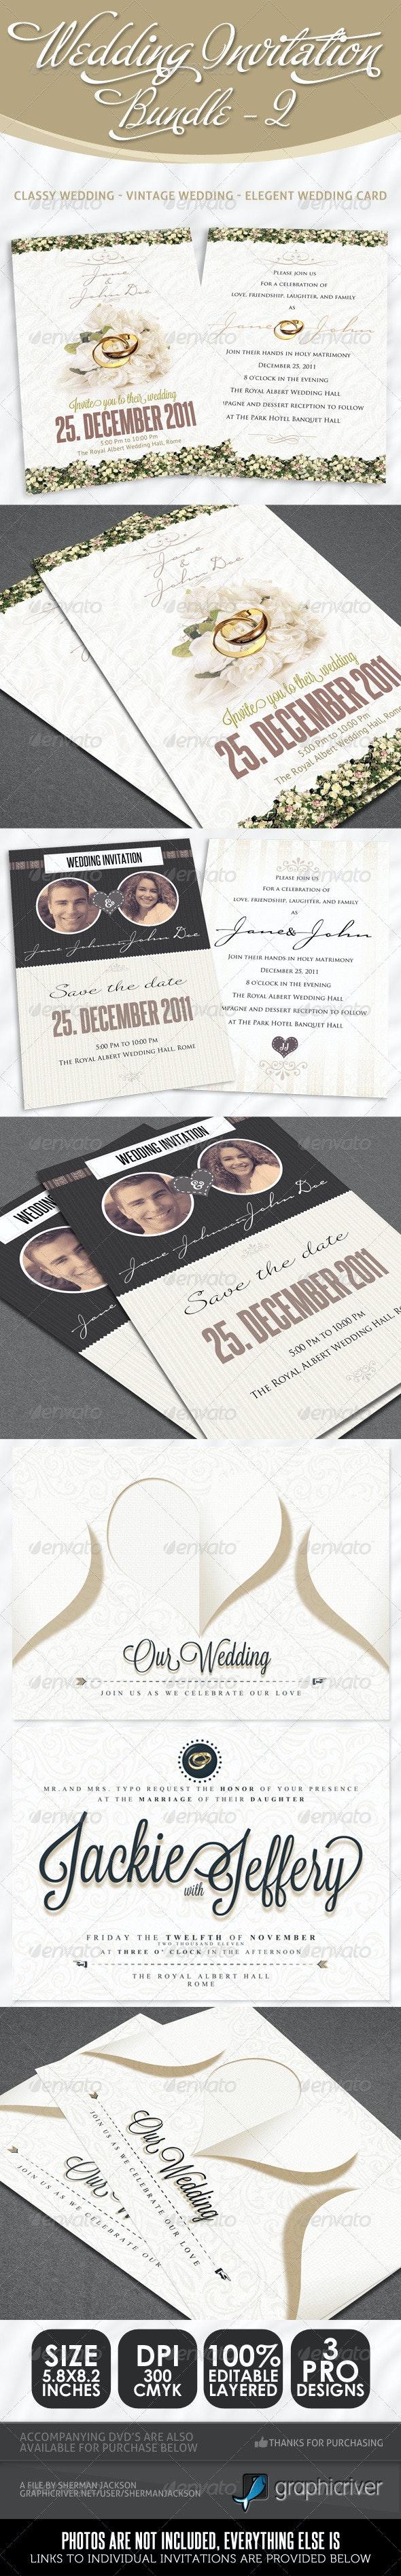 Wedding Invitation Bundle - Pack 2 - Weddings Cards & Invites